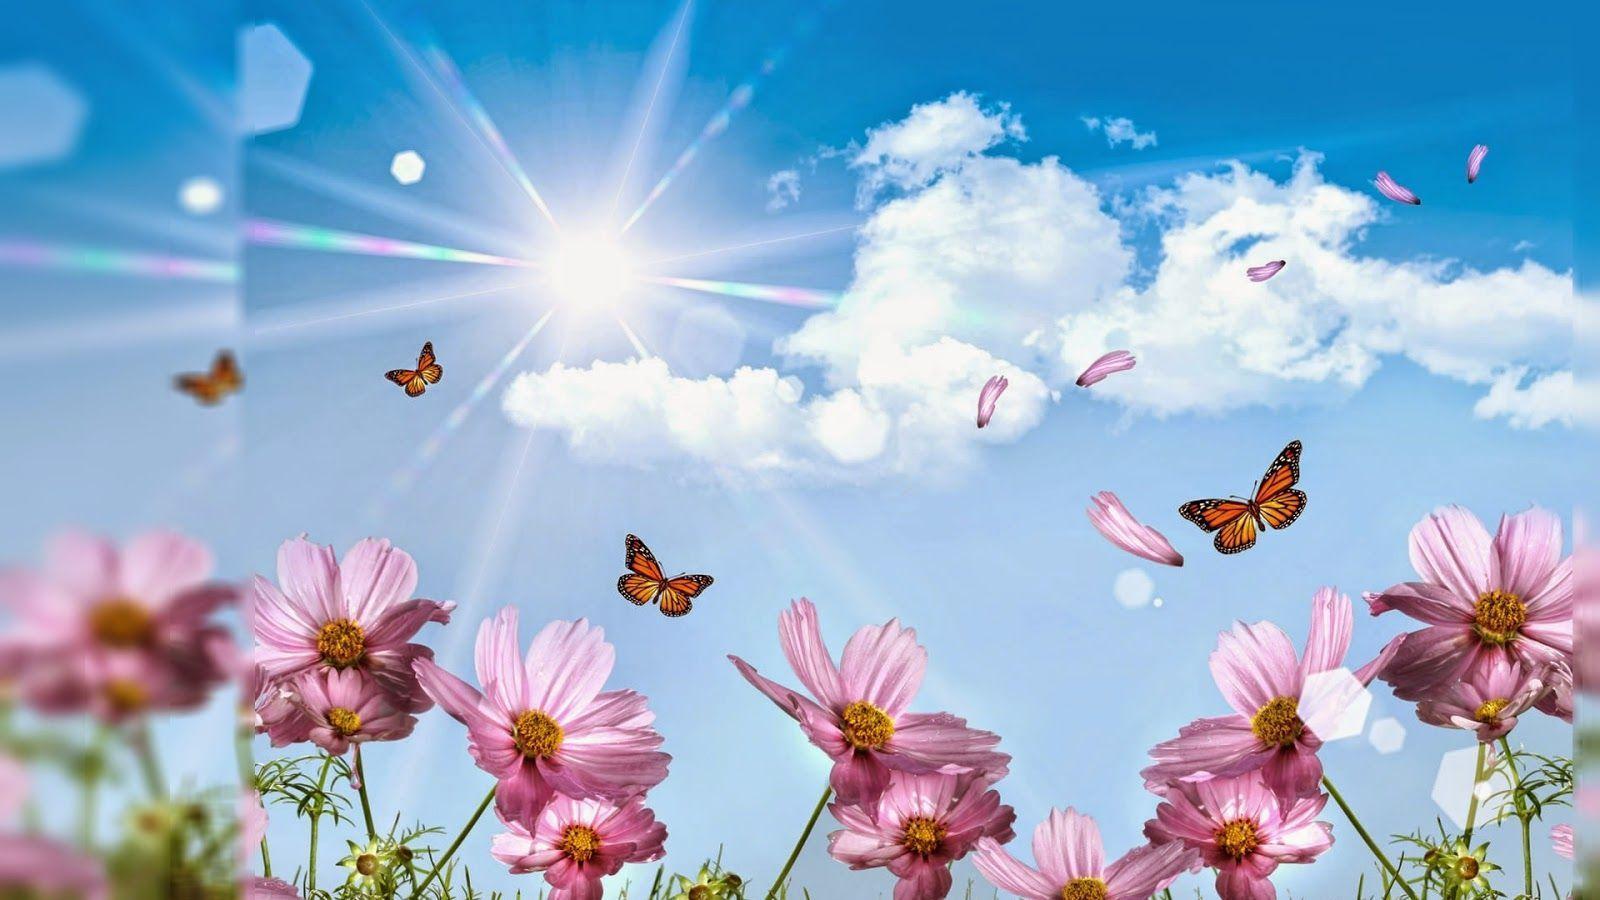 3 Delightful Flowers Wallpaper Desktop Background Full Screen